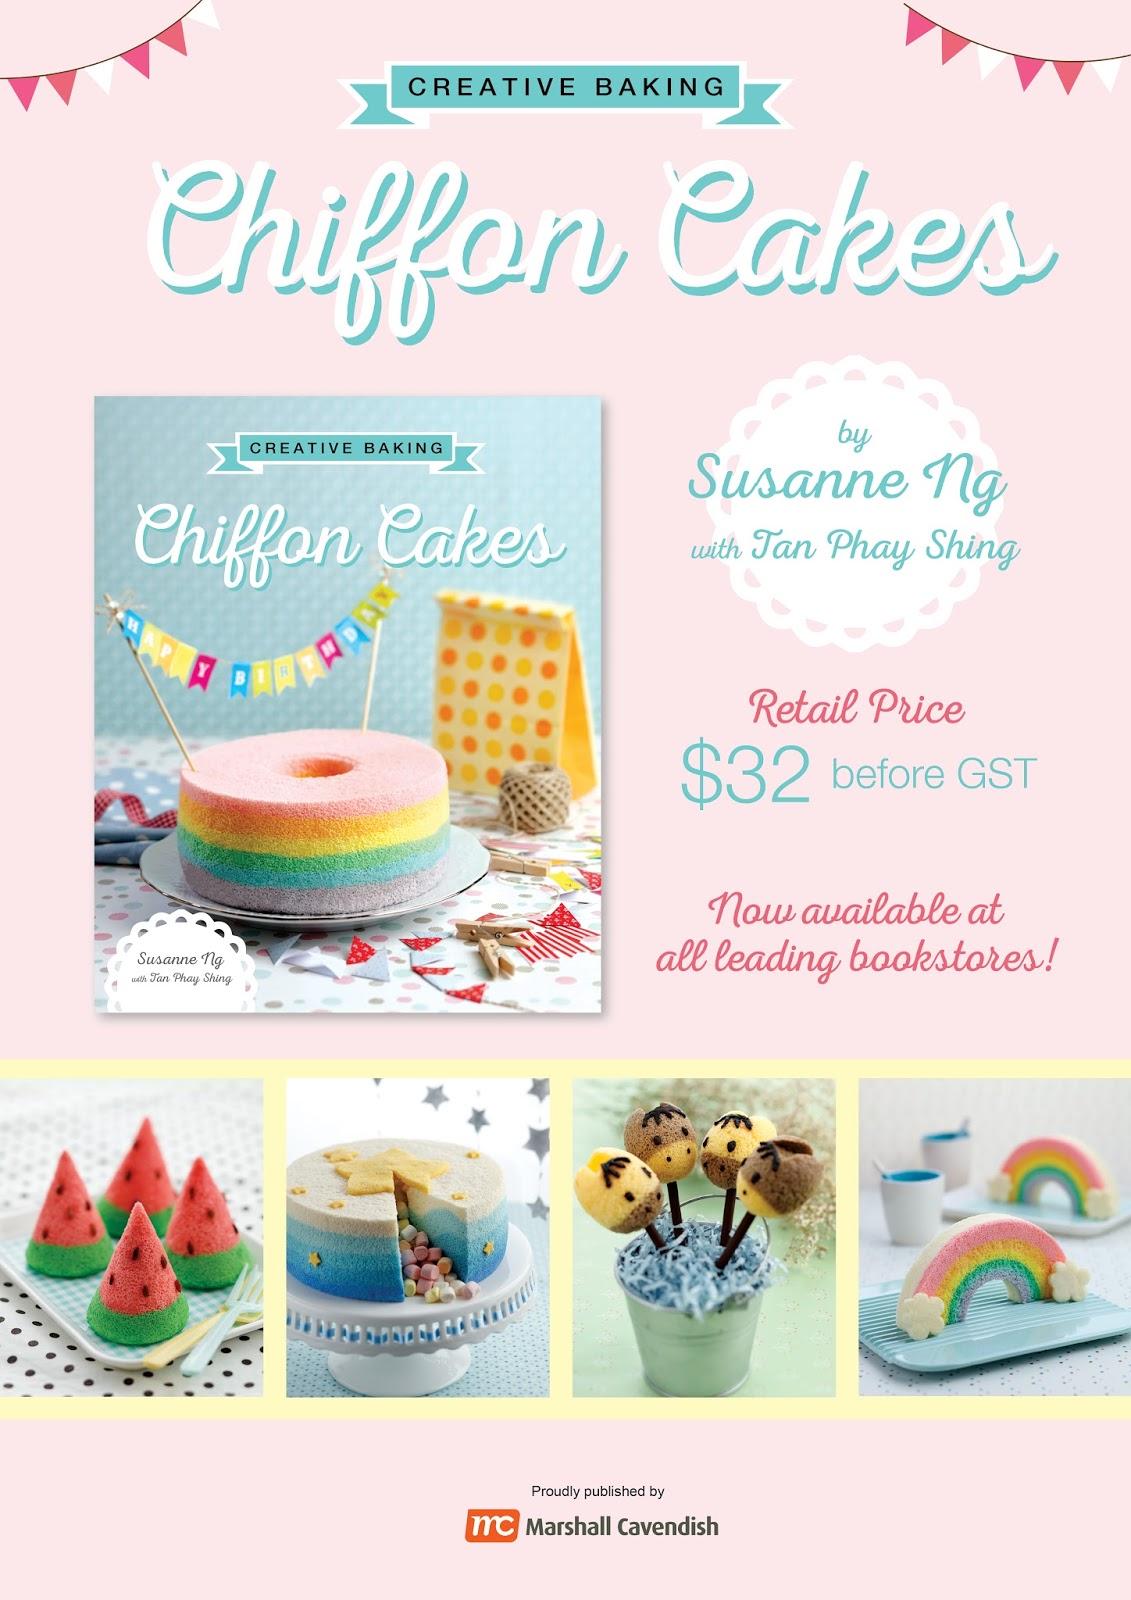 Susanne Ng Chiffon Cake Book